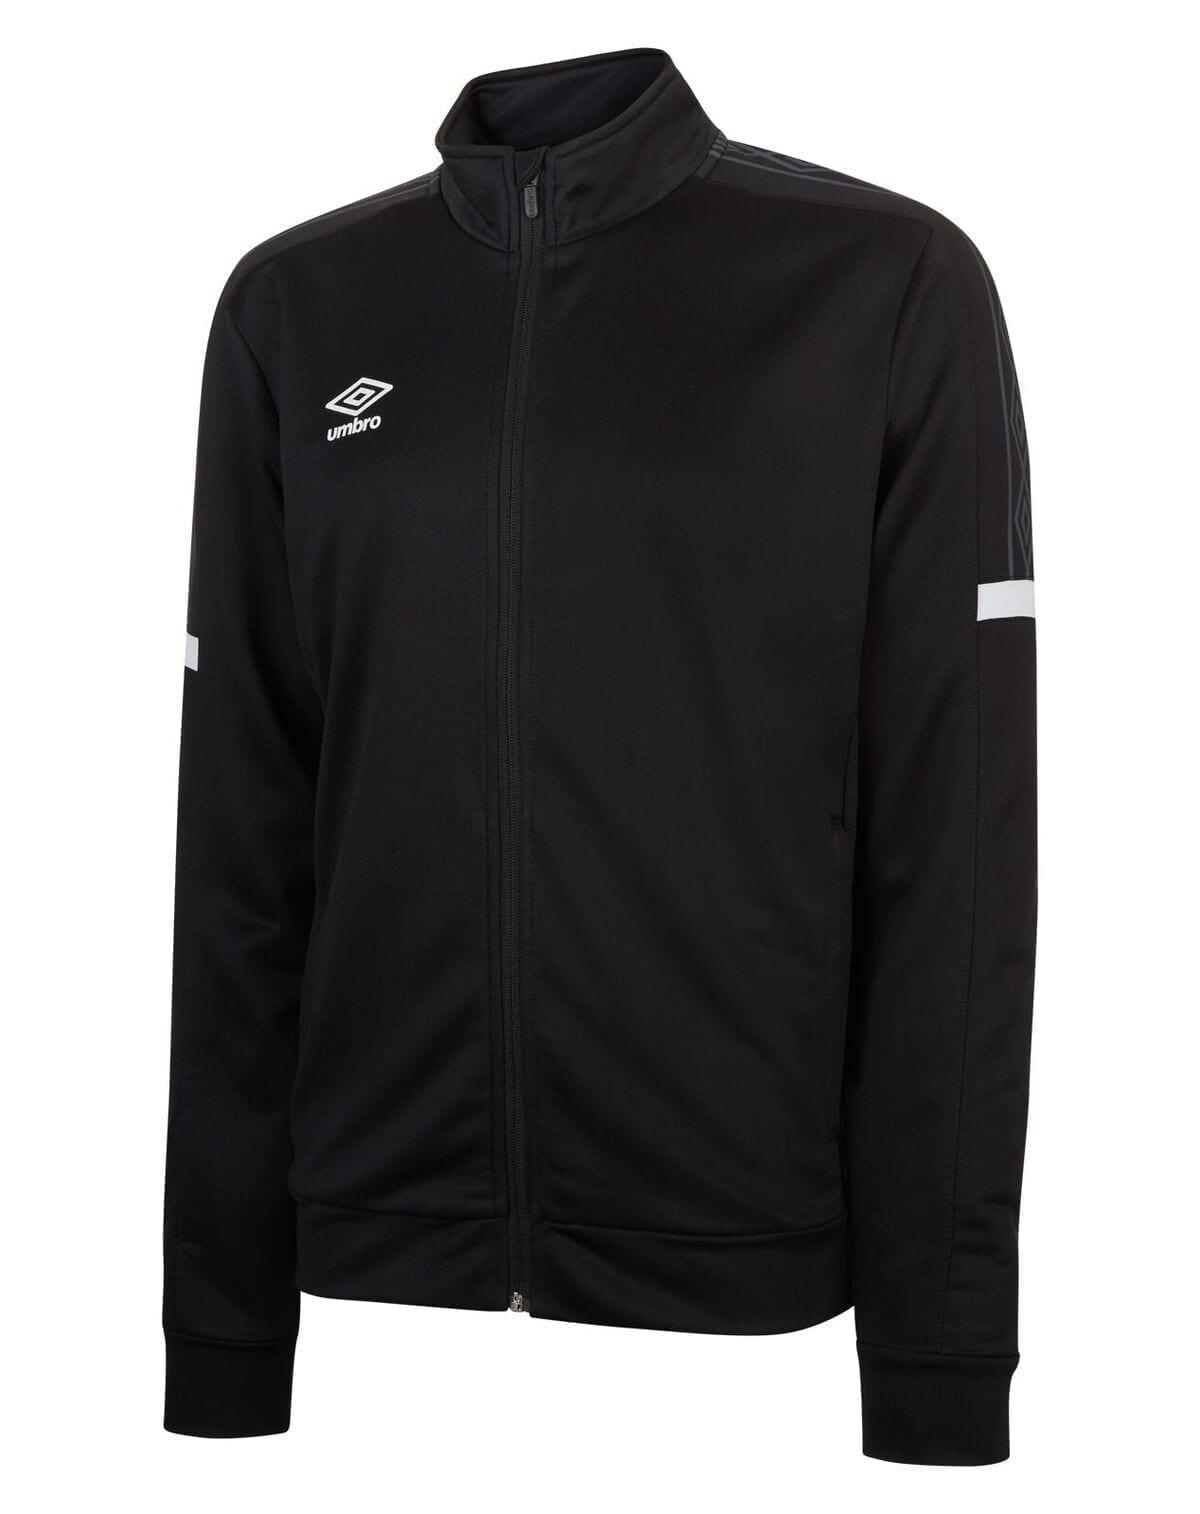 legacy track jacket black 30710 1 p